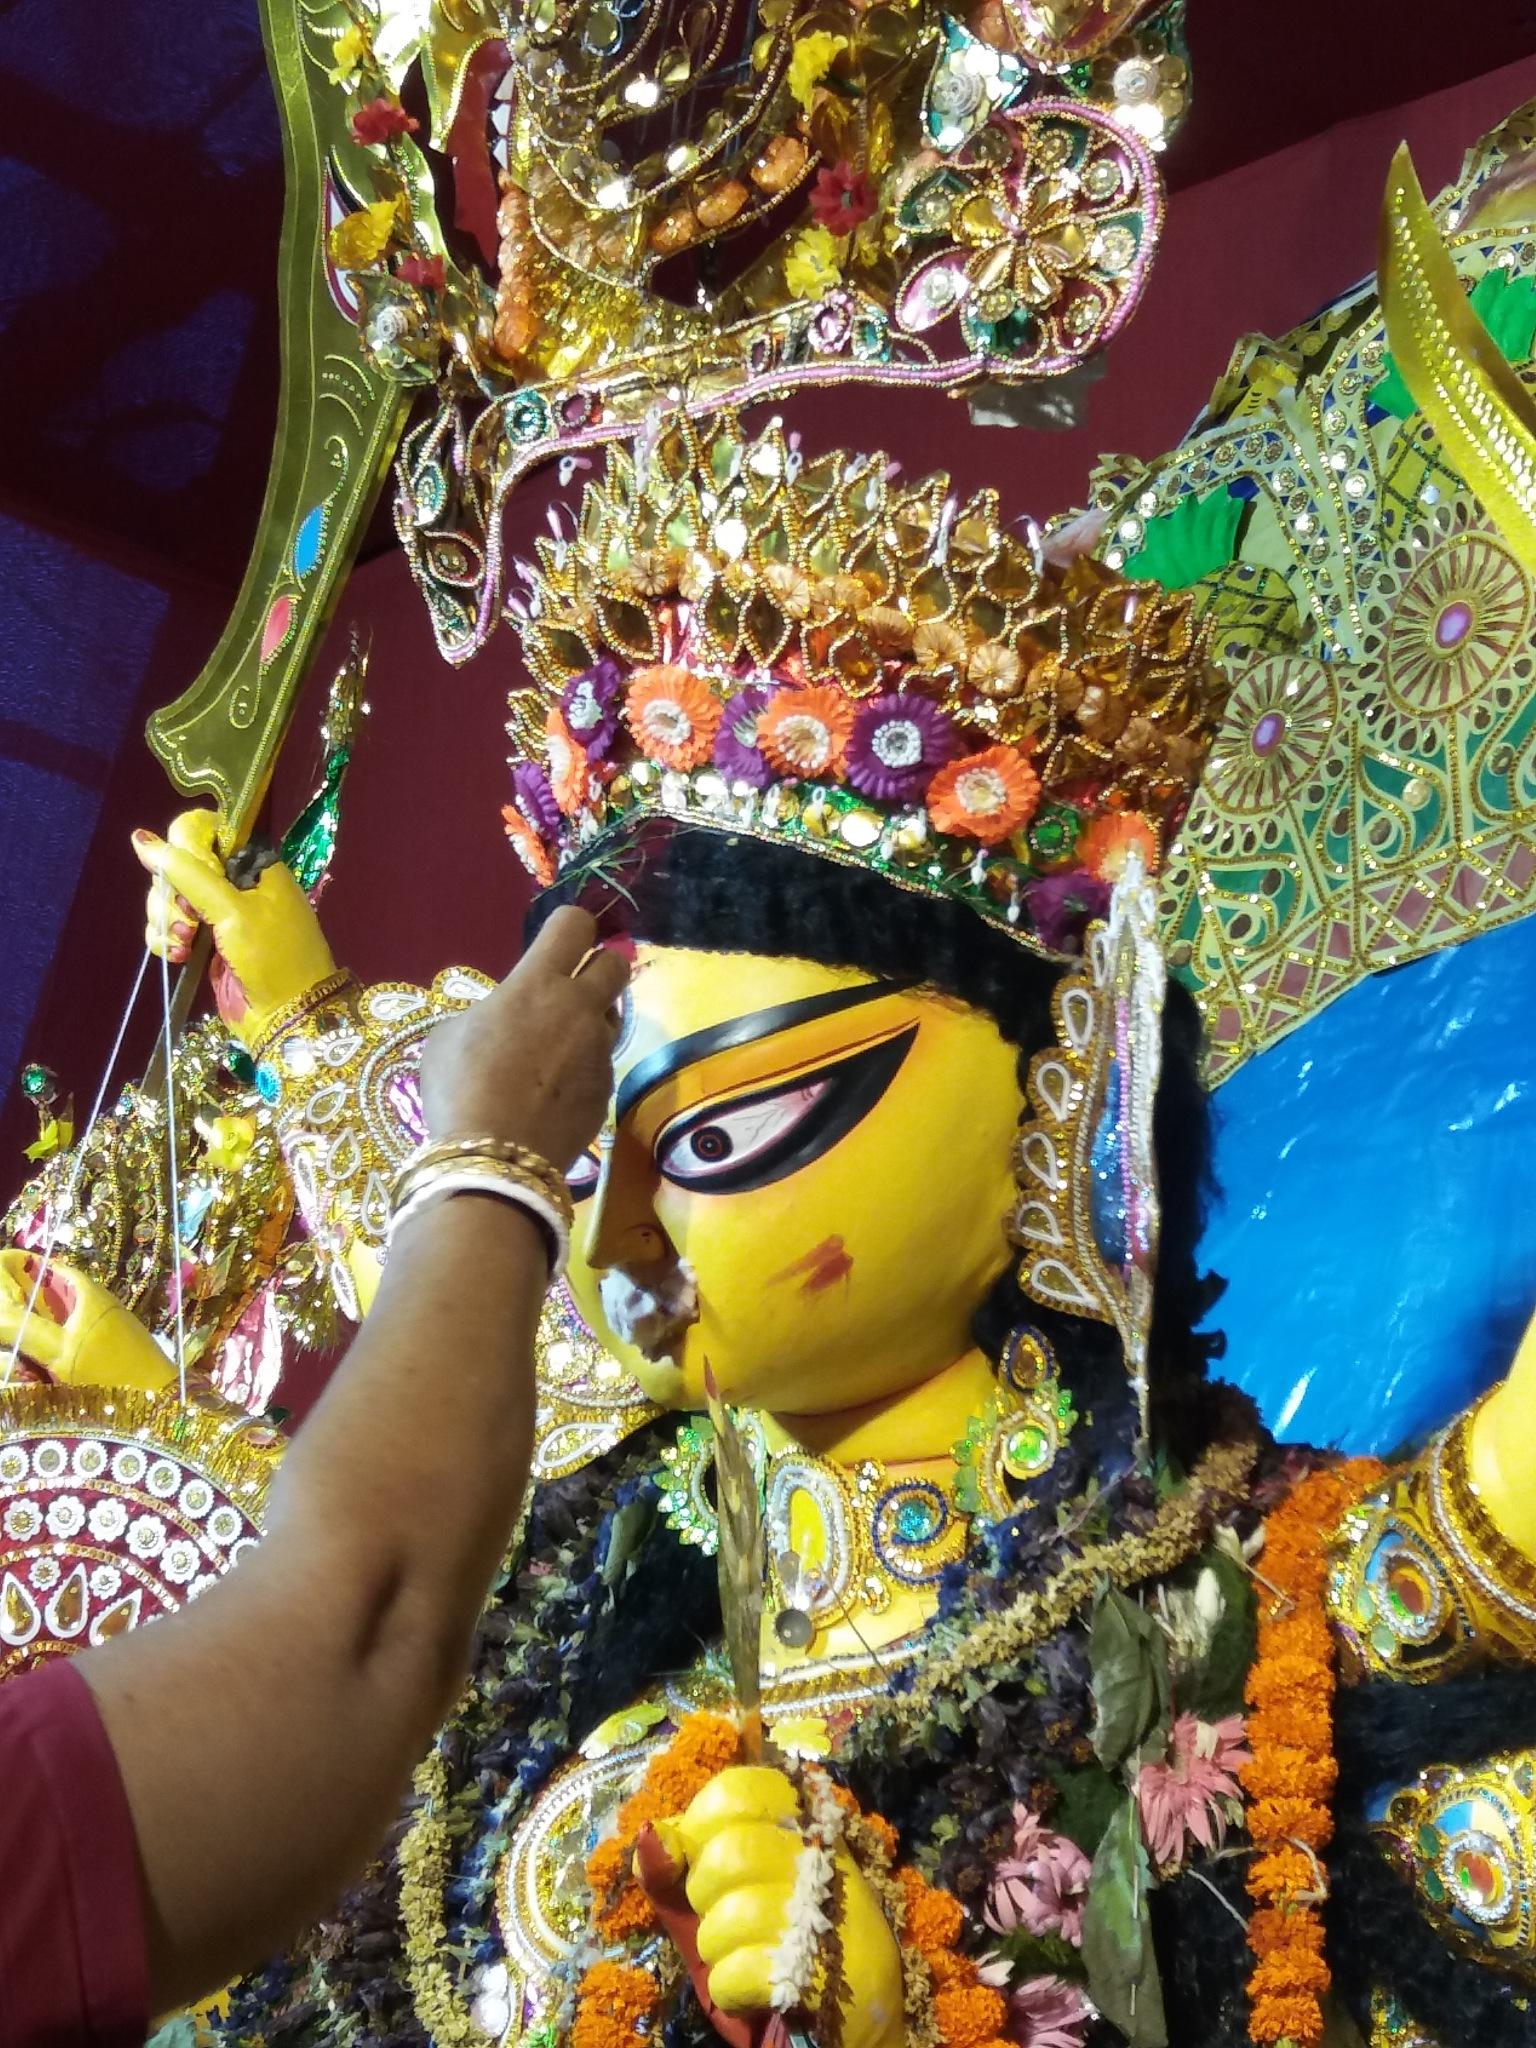 Goddess Durga before her Final Journey by Arjun Dasgupta